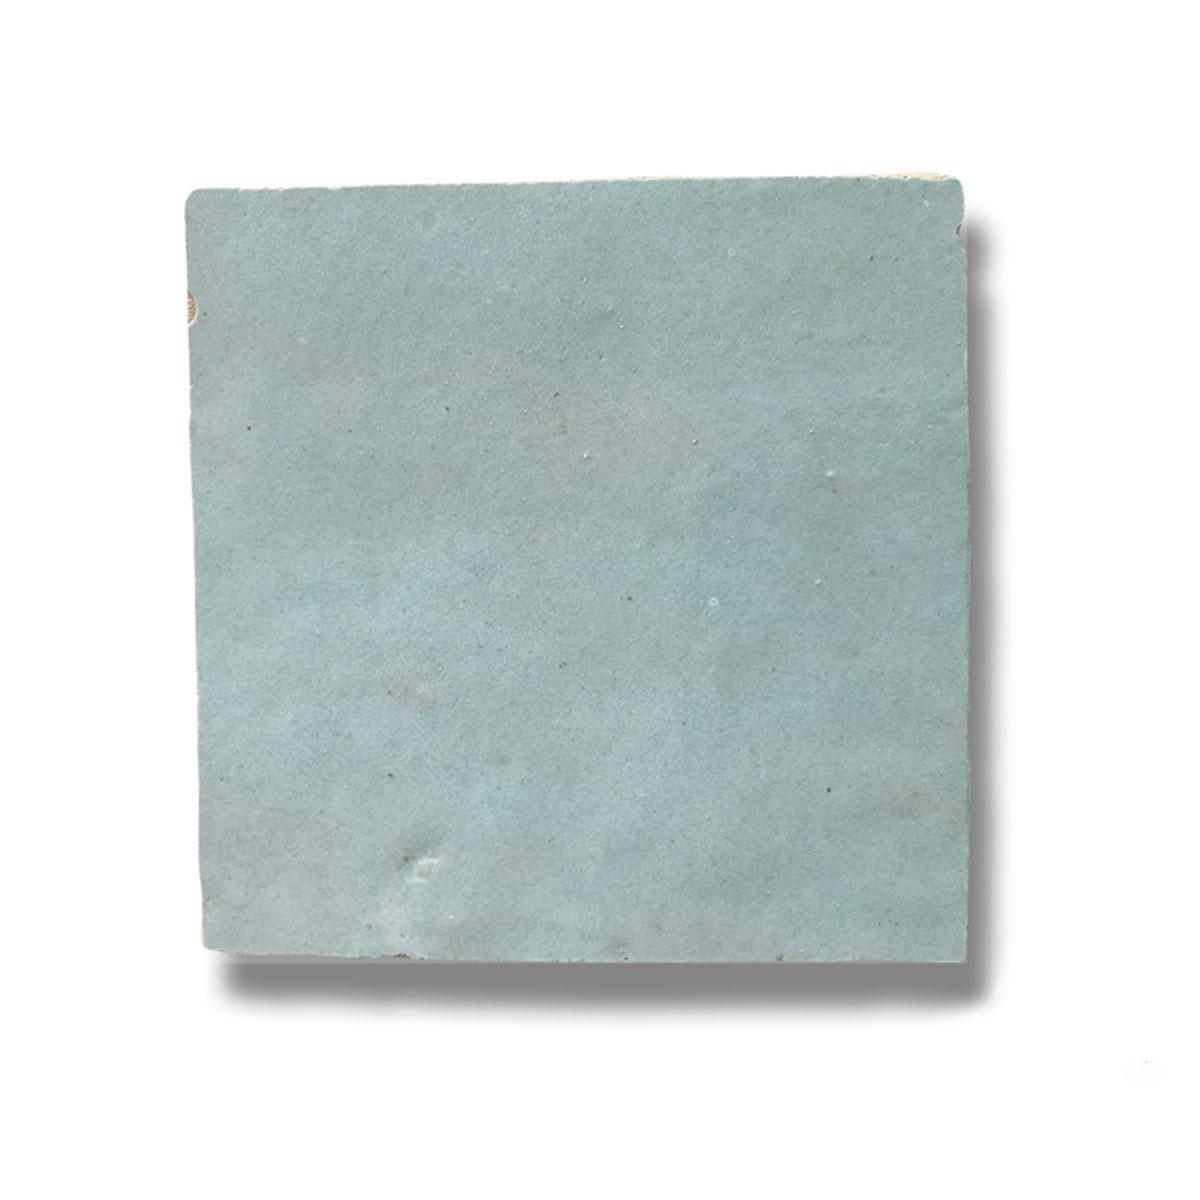 Clay Zellige - Aquamarine - Moroccan feature tiles - Stone3 Brisbane